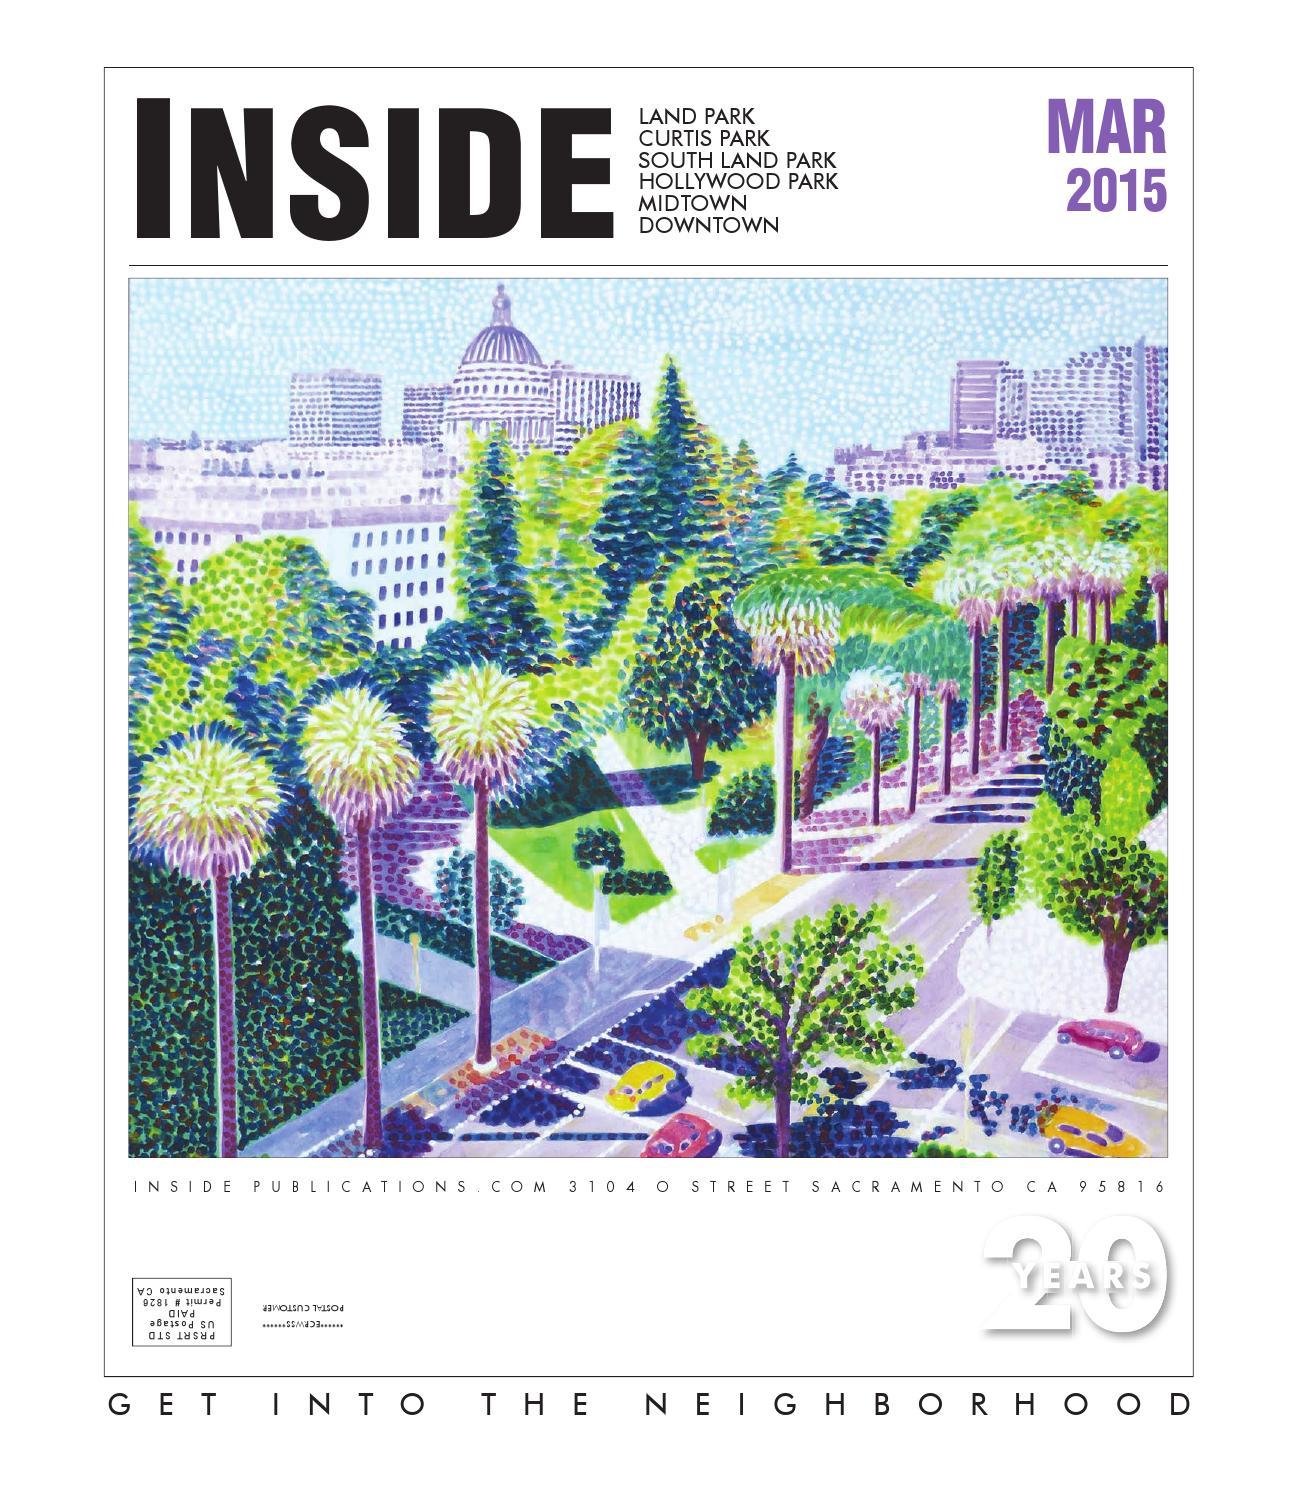 Inside land park mar 2015 by Inside Publications - issuu